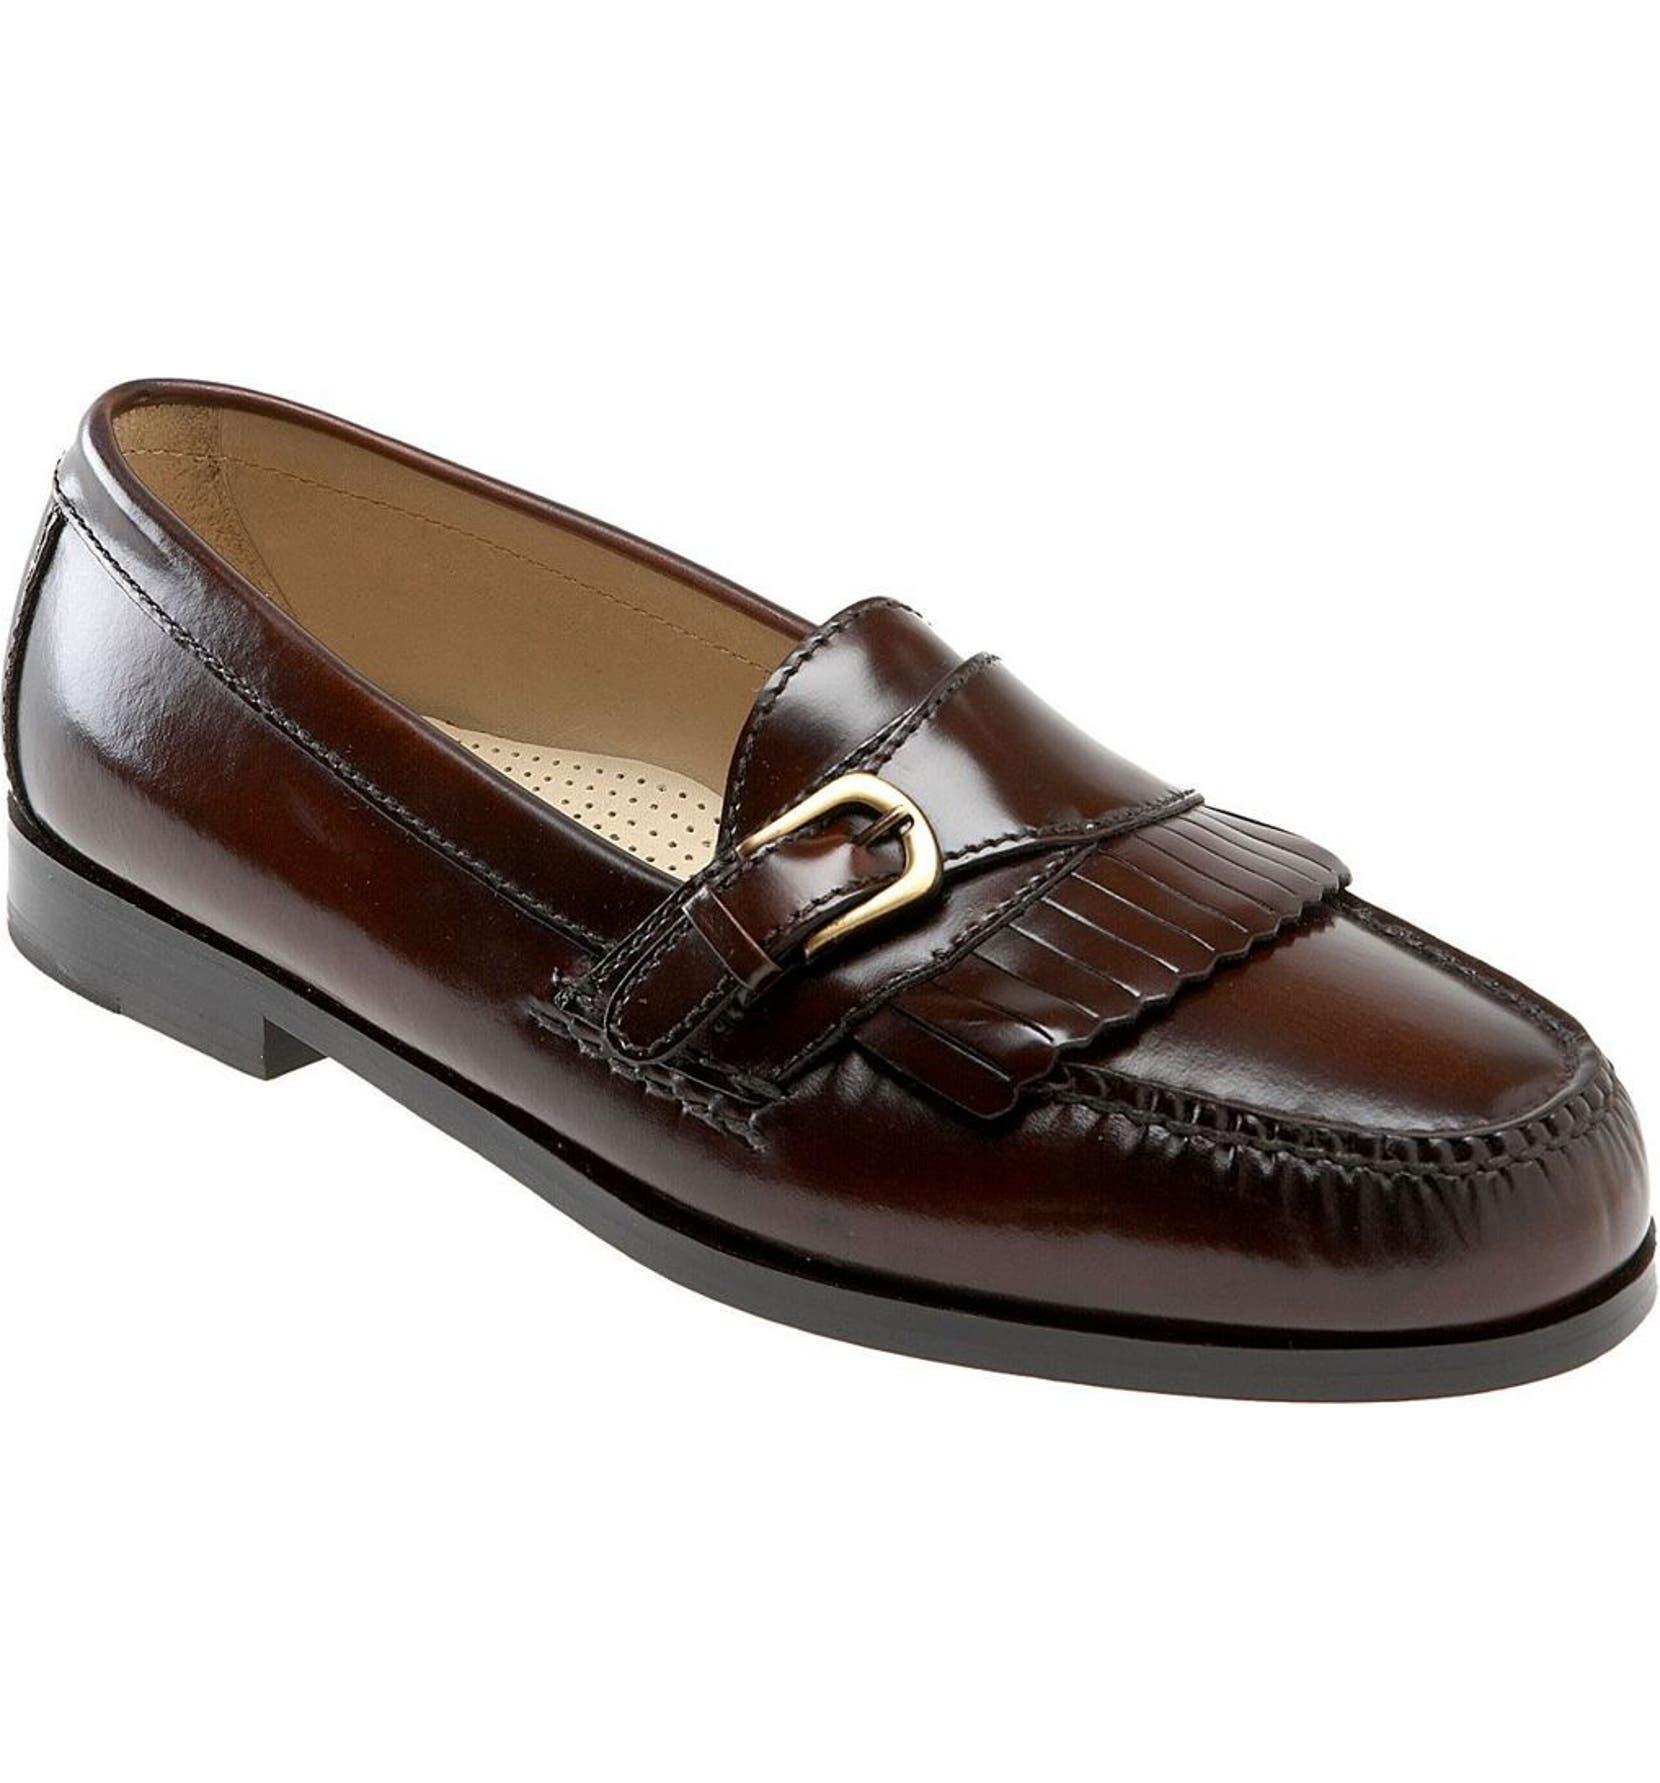 81ff1b2e53b Cole Haan  Pinch Buckle  Loafer (Men)